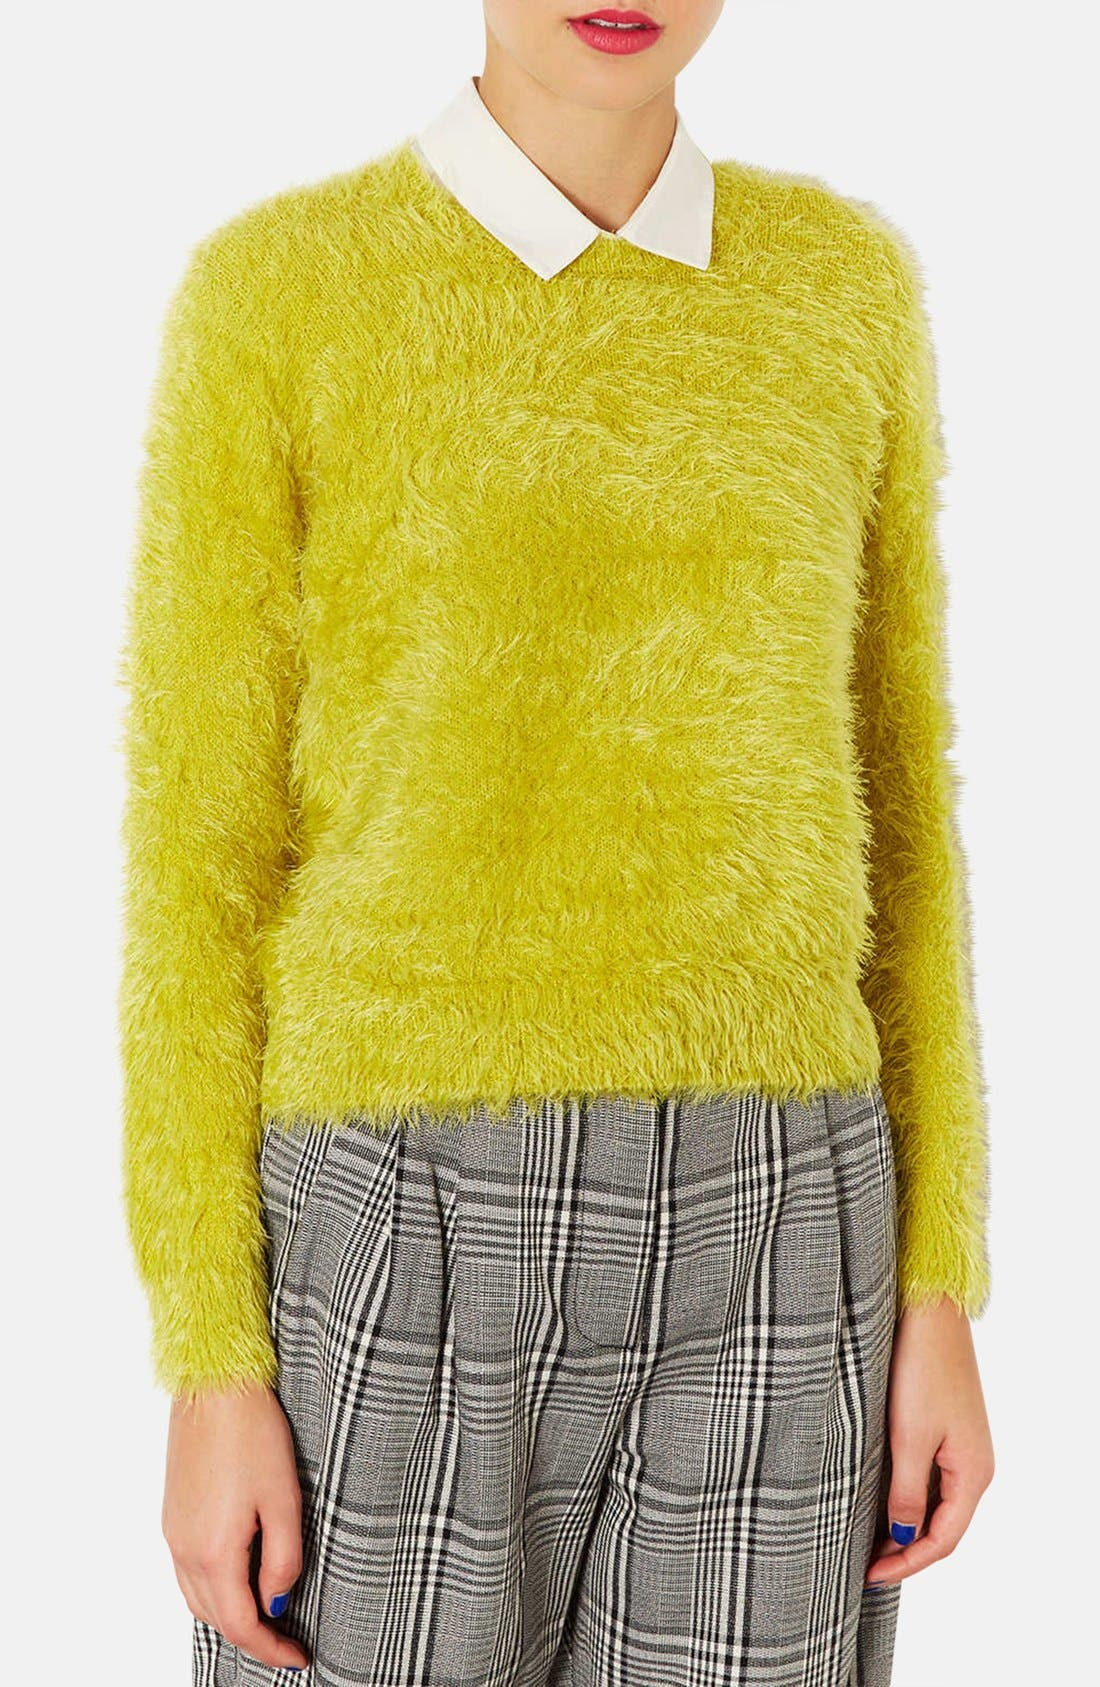 Alternate Image 1 Selected - Topshop Textured Crewneck Sweater (Petite)